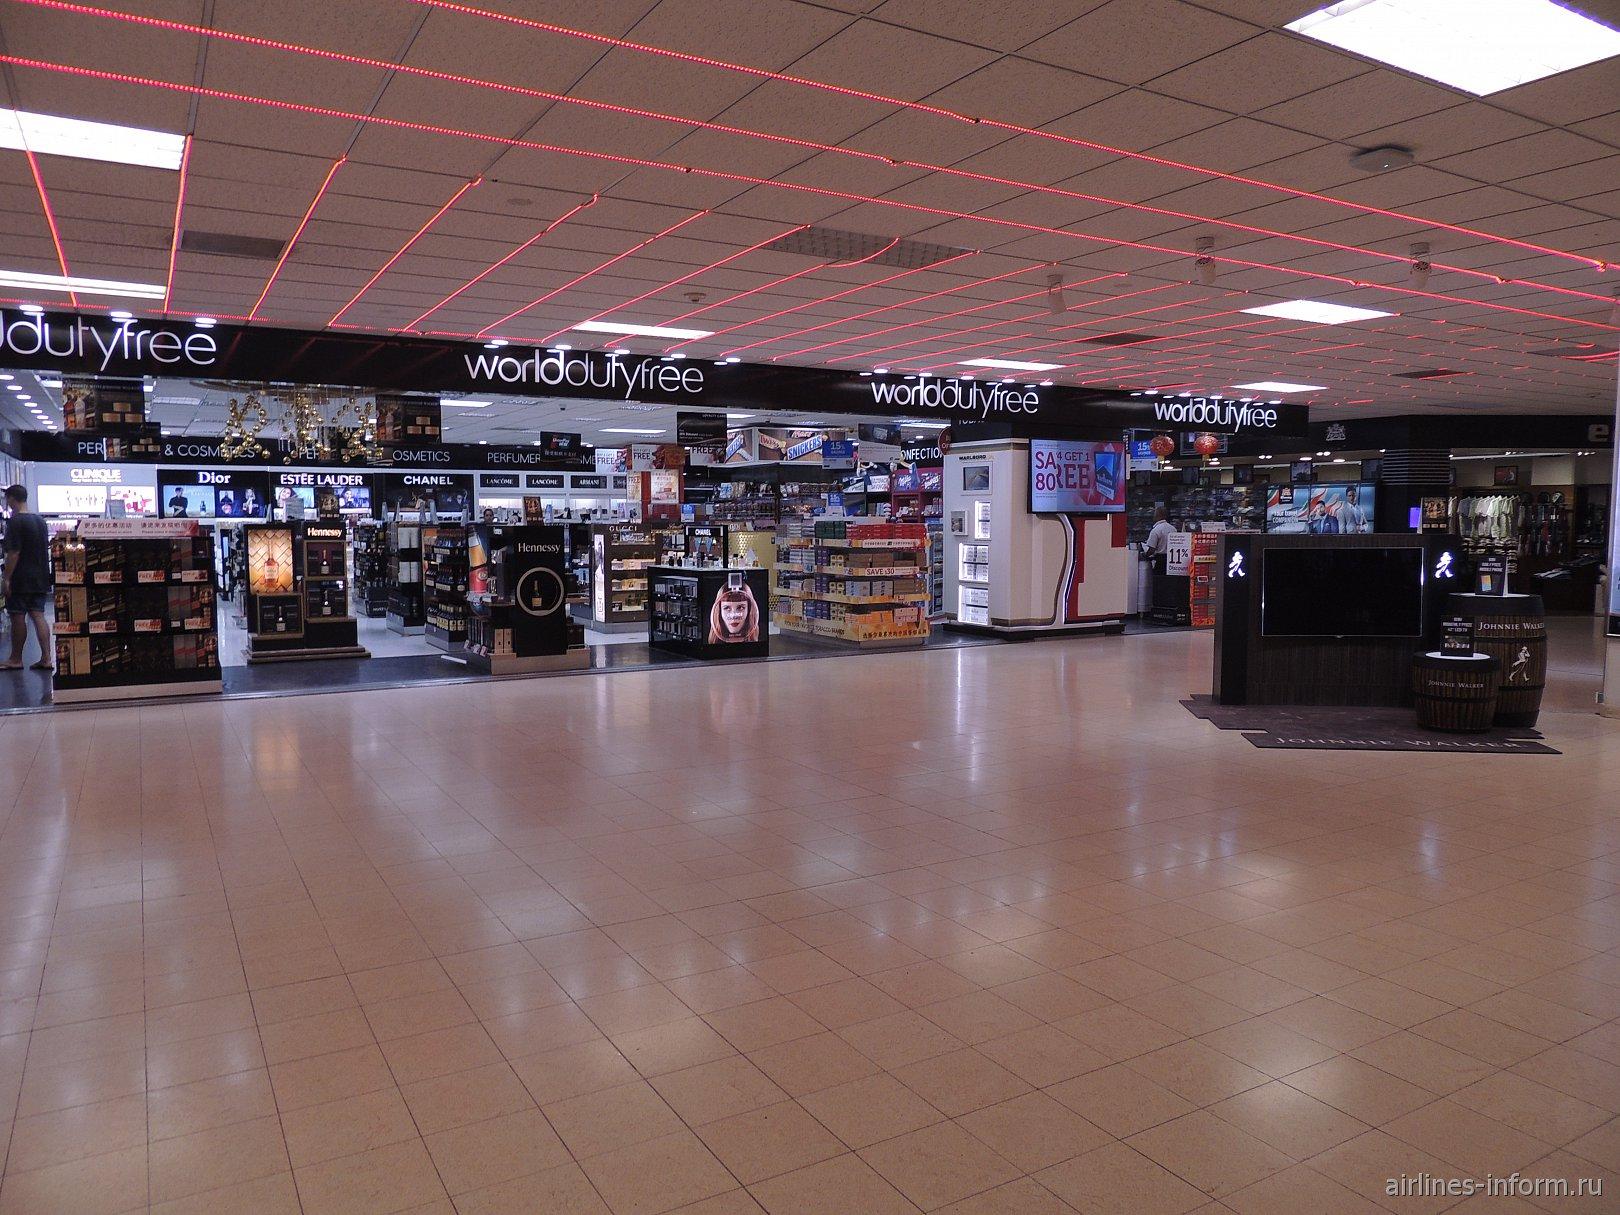 Магазин duty-free в аэропорту Коломбо Бандаранайке